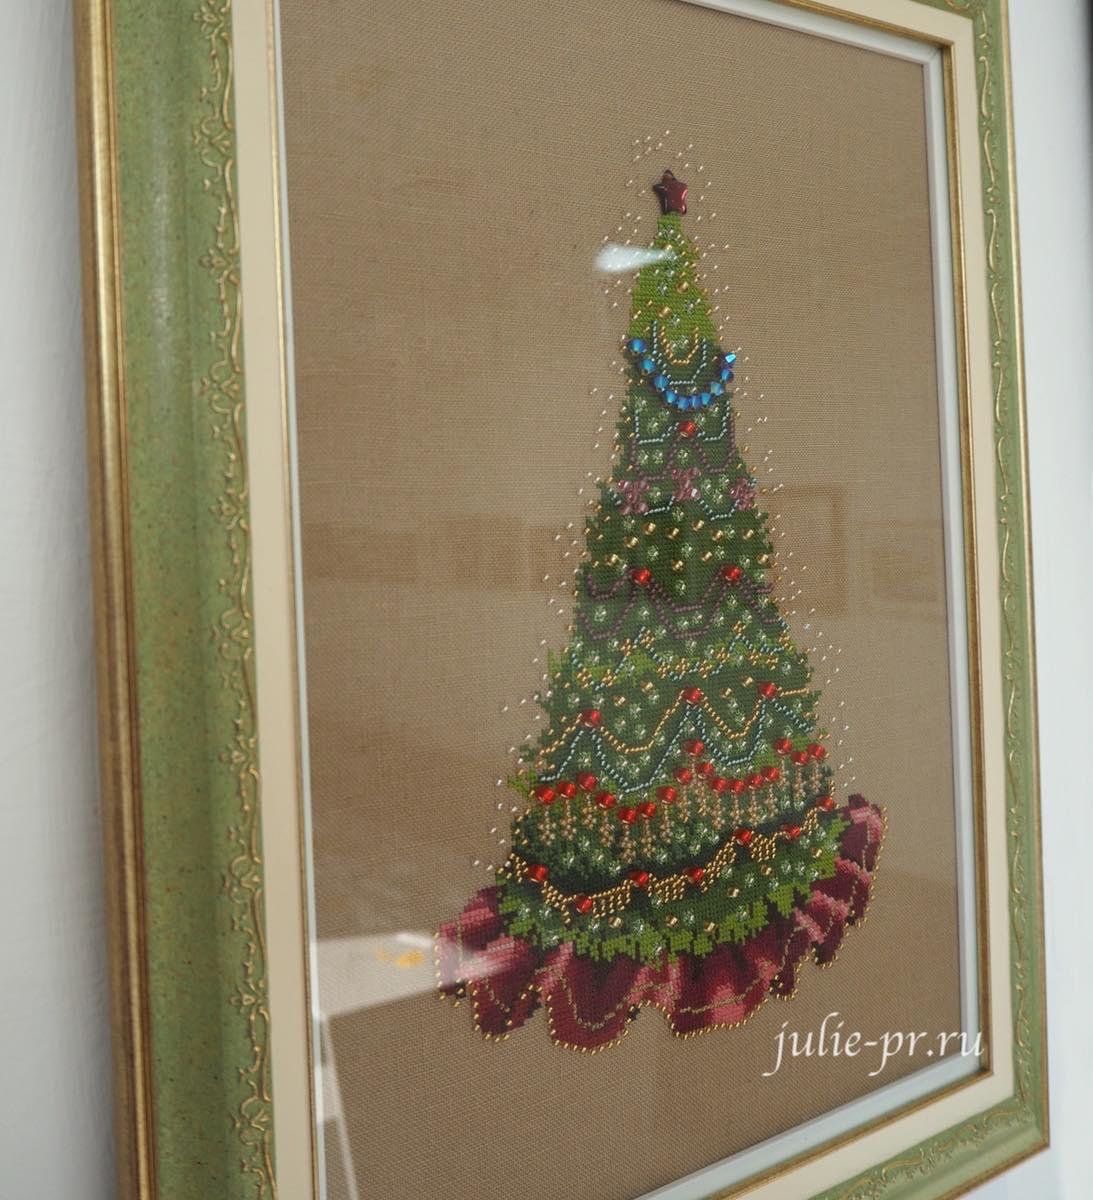 Mirabilia, Christmas Tree 2006, Рождественская елка 2006, вышивка крестом